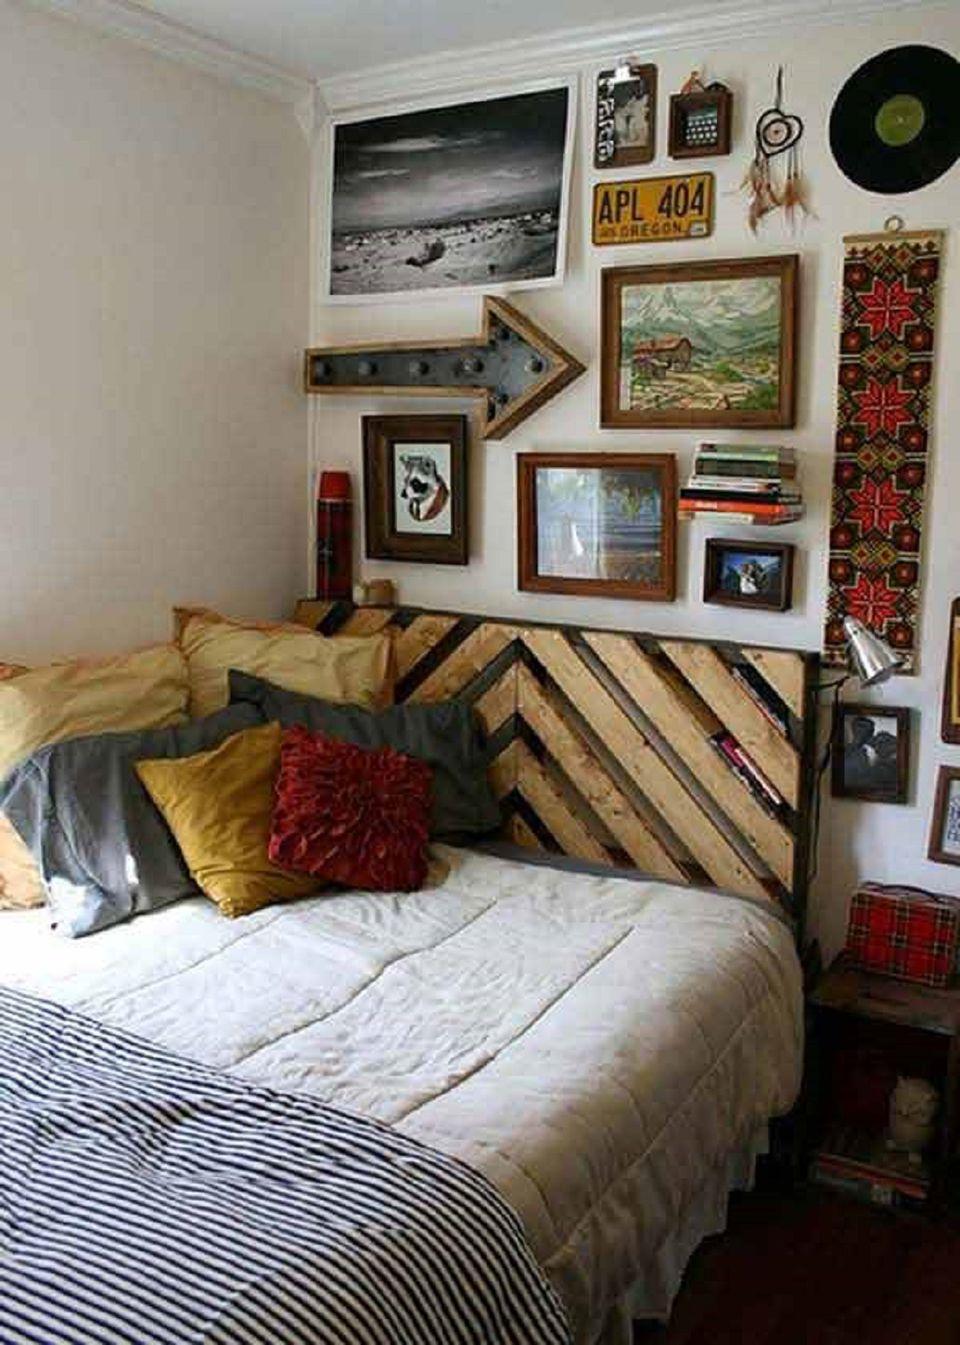 Beautiful Boho Bedroom Decorating Ideas and Photos on Boho Room Decor  id=27563